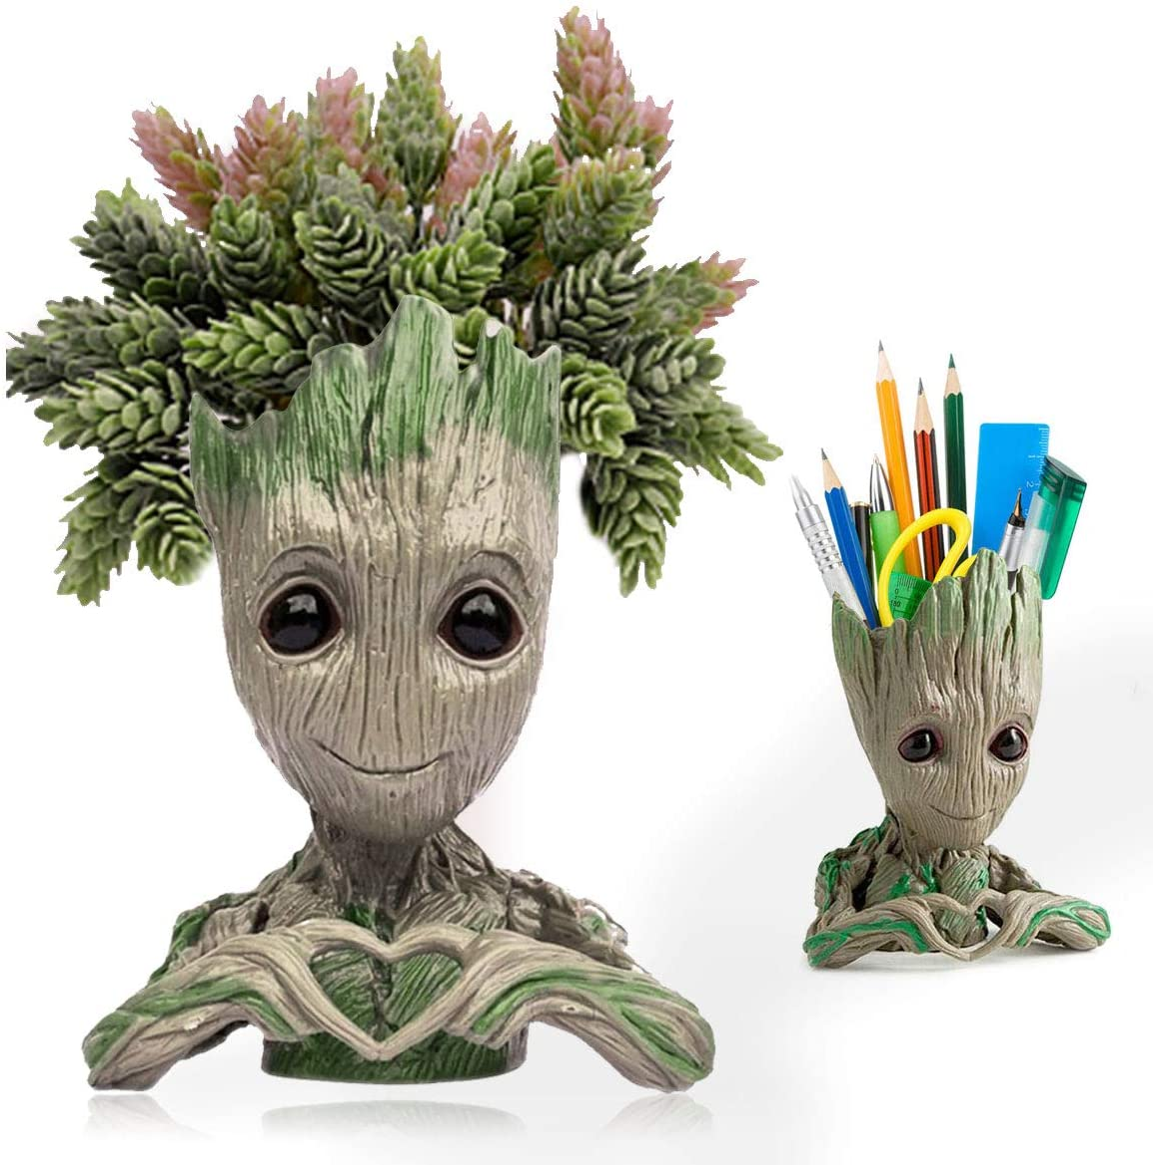 Groot Planter,Baby Groot Flower Pot Succulent Planter for Garden Decor Desktop,Groot Pencil Pen Holder for Kids Toy Gifts